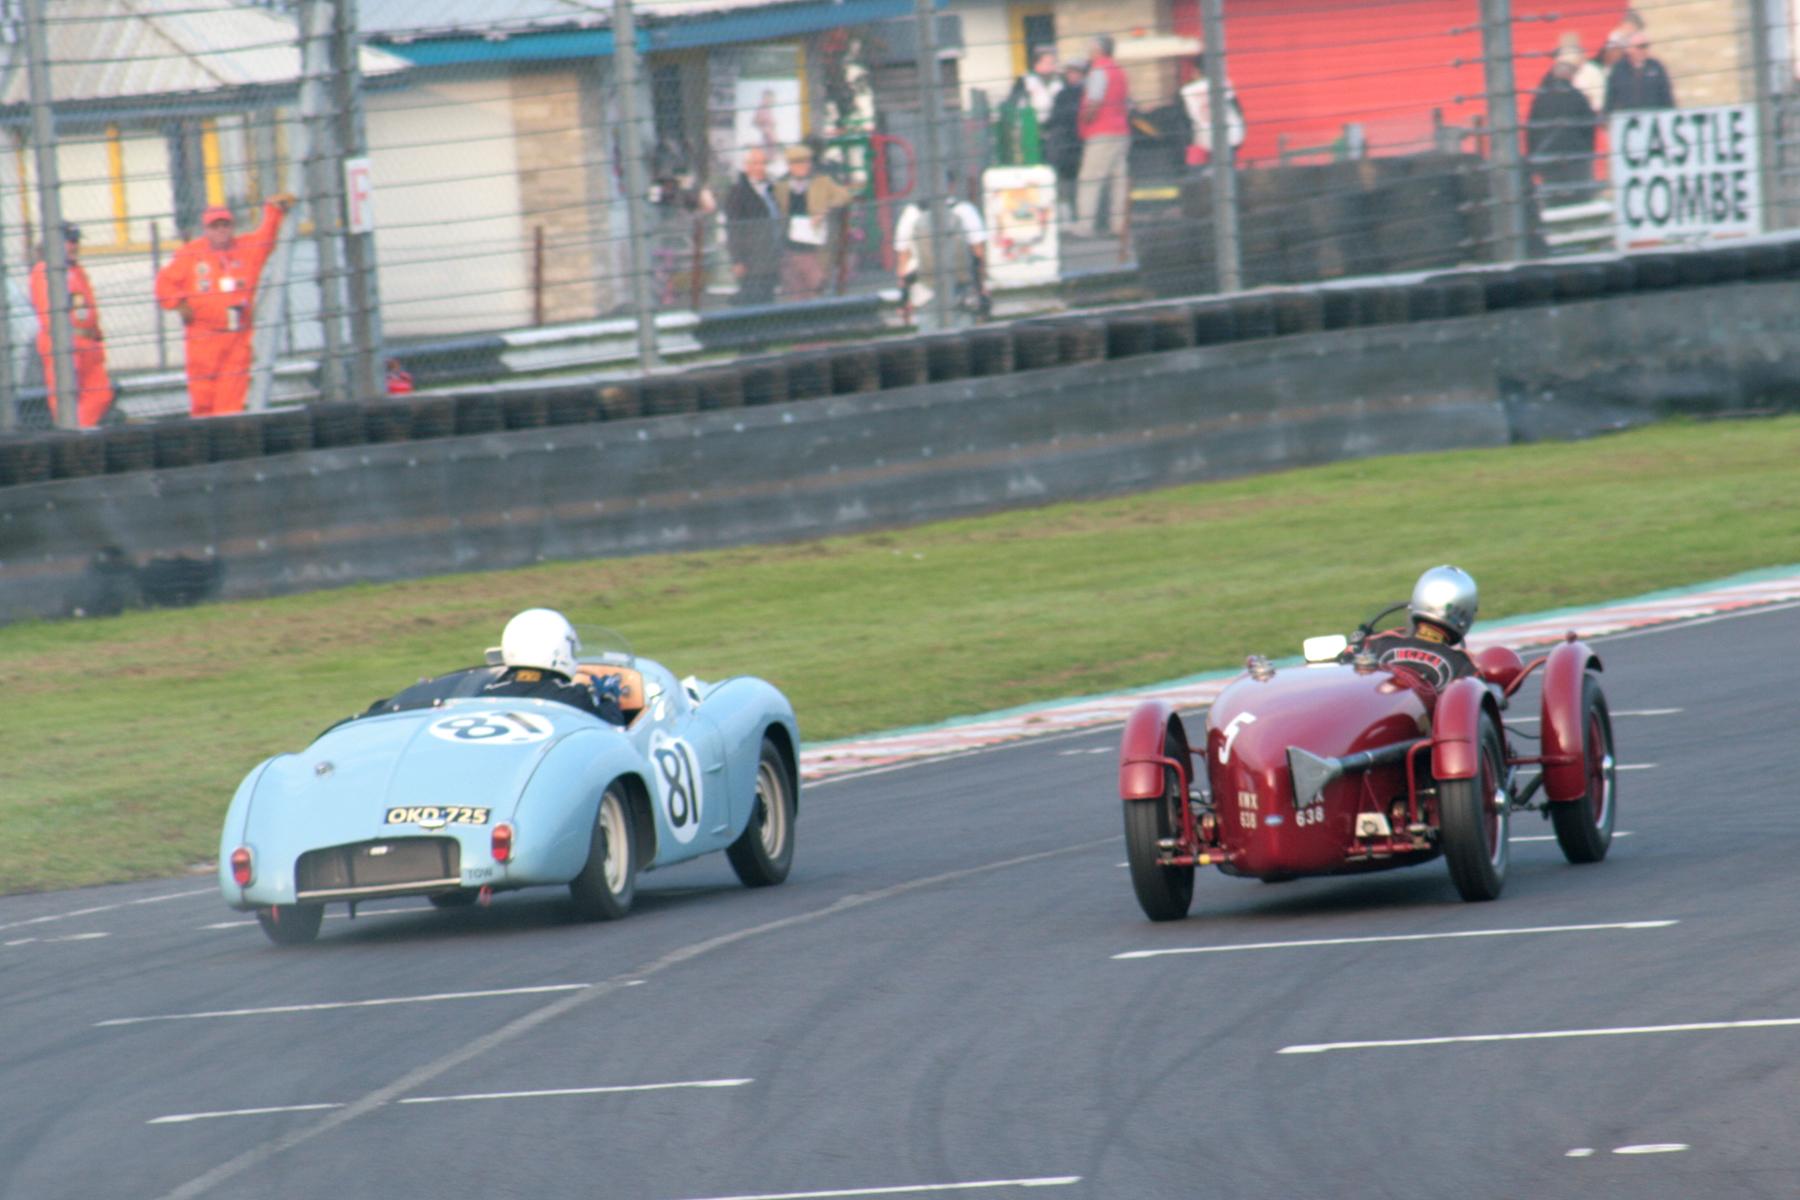 Mark Gillies gets ahead as Richard Gane runs wide  Photo - John Turner